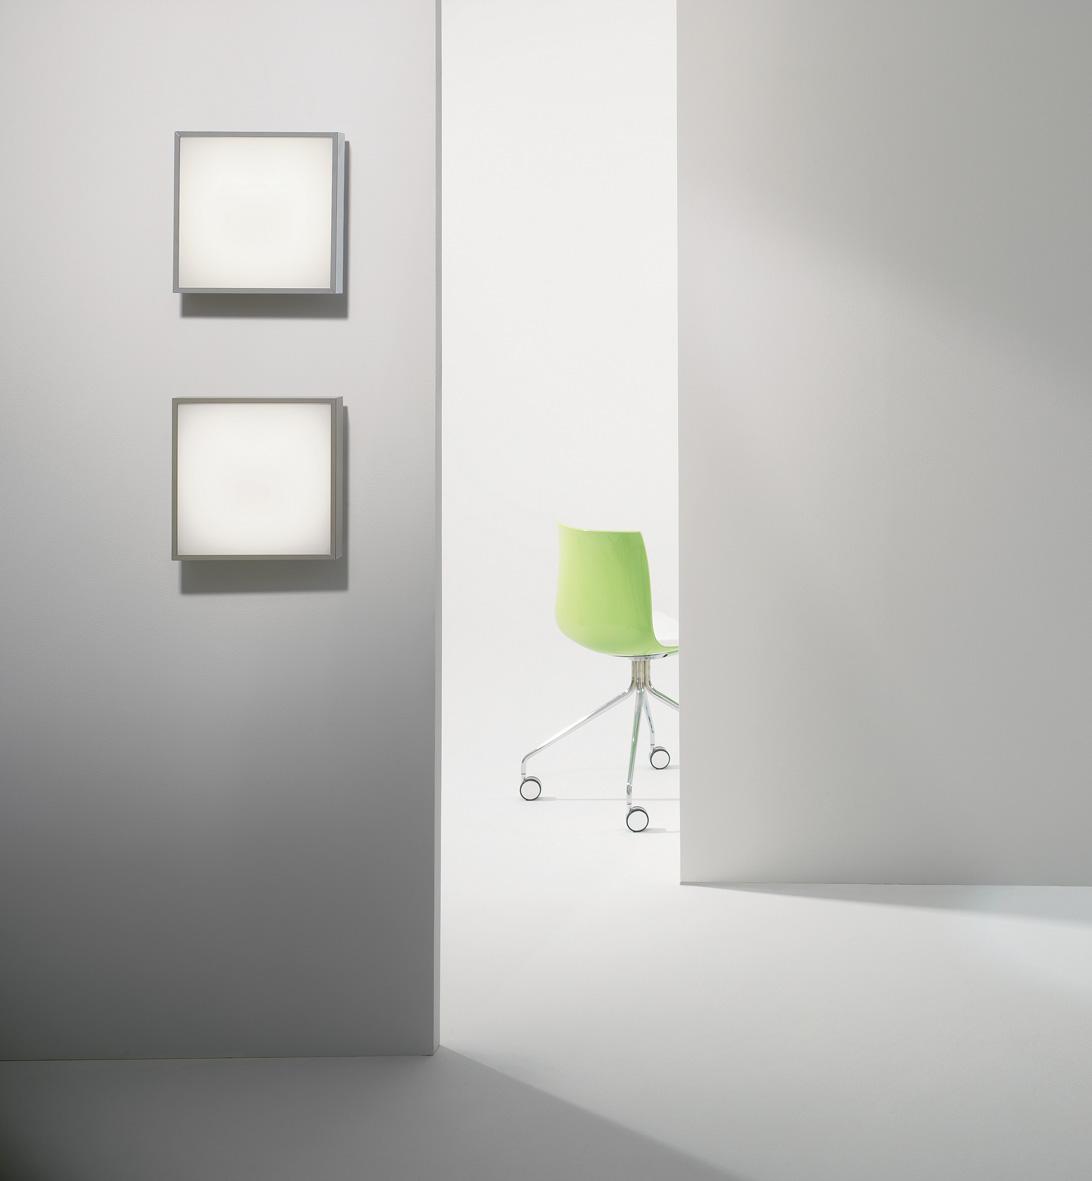 square bathroom ceiling light. Astro Taketa LED Square Bathroom Ceiling Light 16W Polished Chrome IP44 8